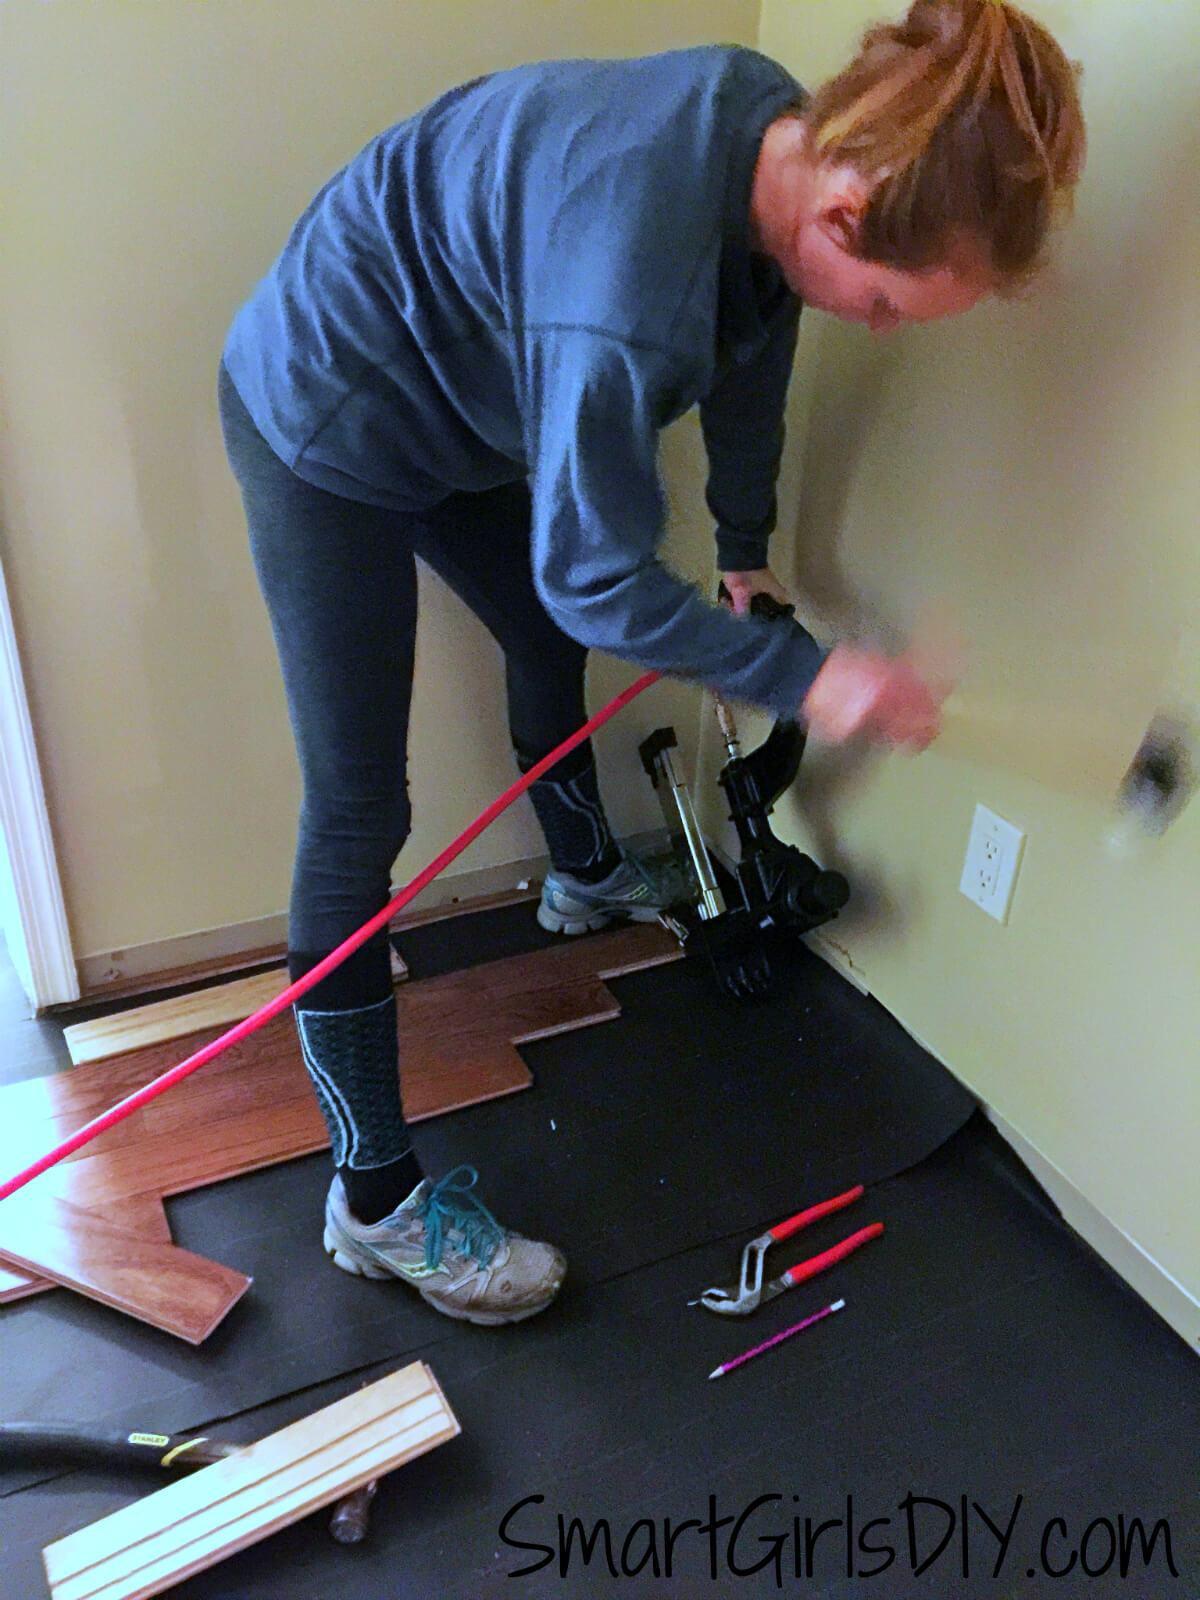 average price per square foot to install hardwood flooring of upstairs hallway 1 installing hardwood floors with regard to installing bruce hardwood floor diy